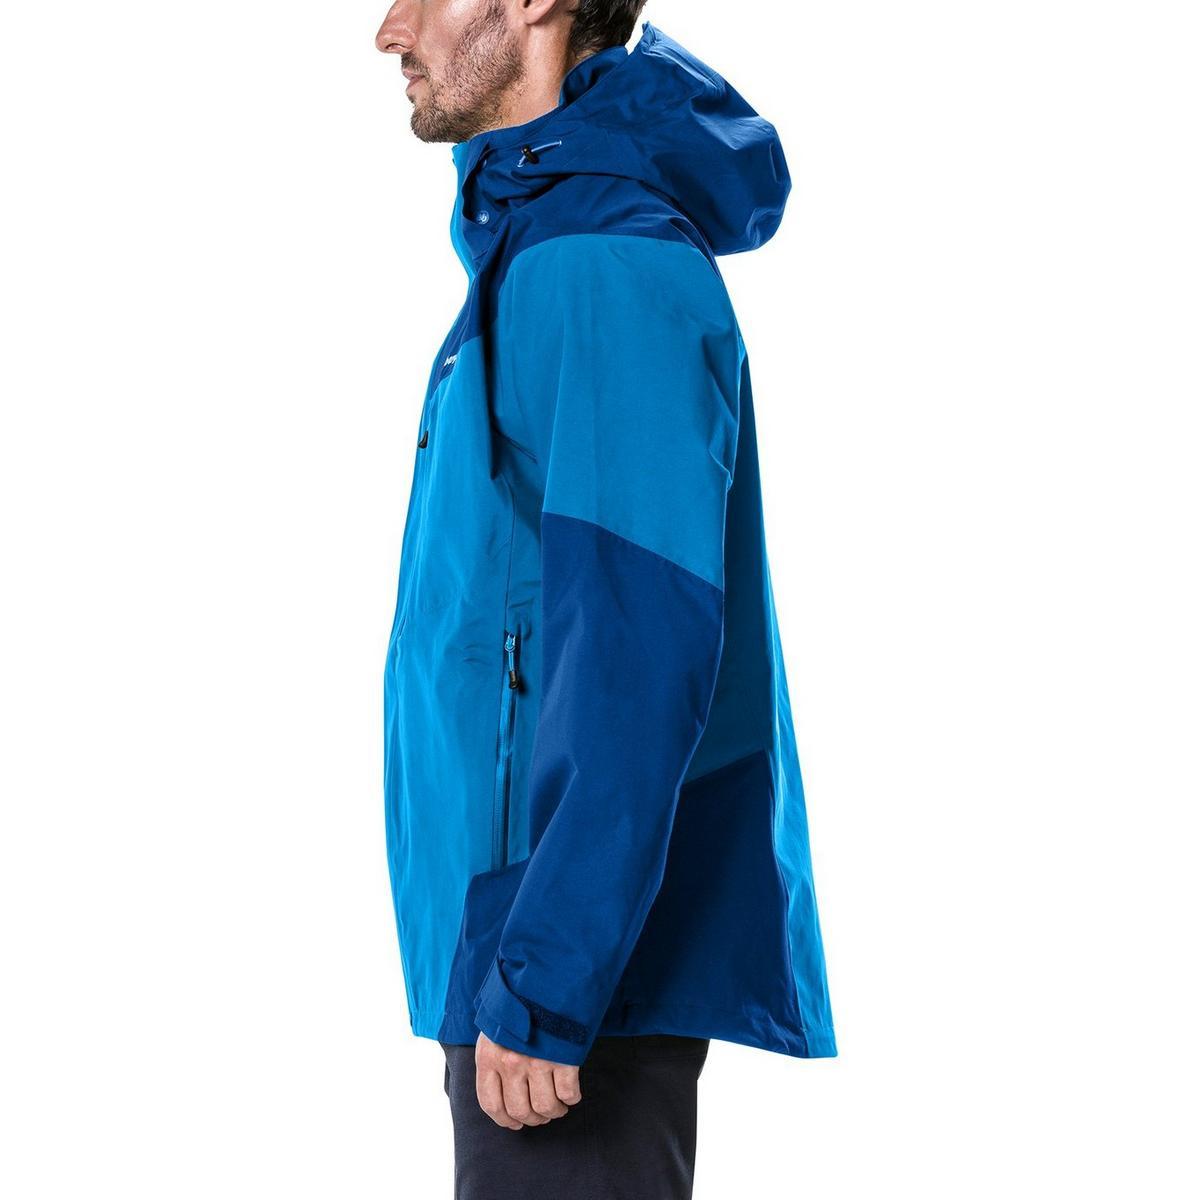 Berghaus Men's Berghaus Arran 3in1 Insulated Waterproof Jacket - Blue